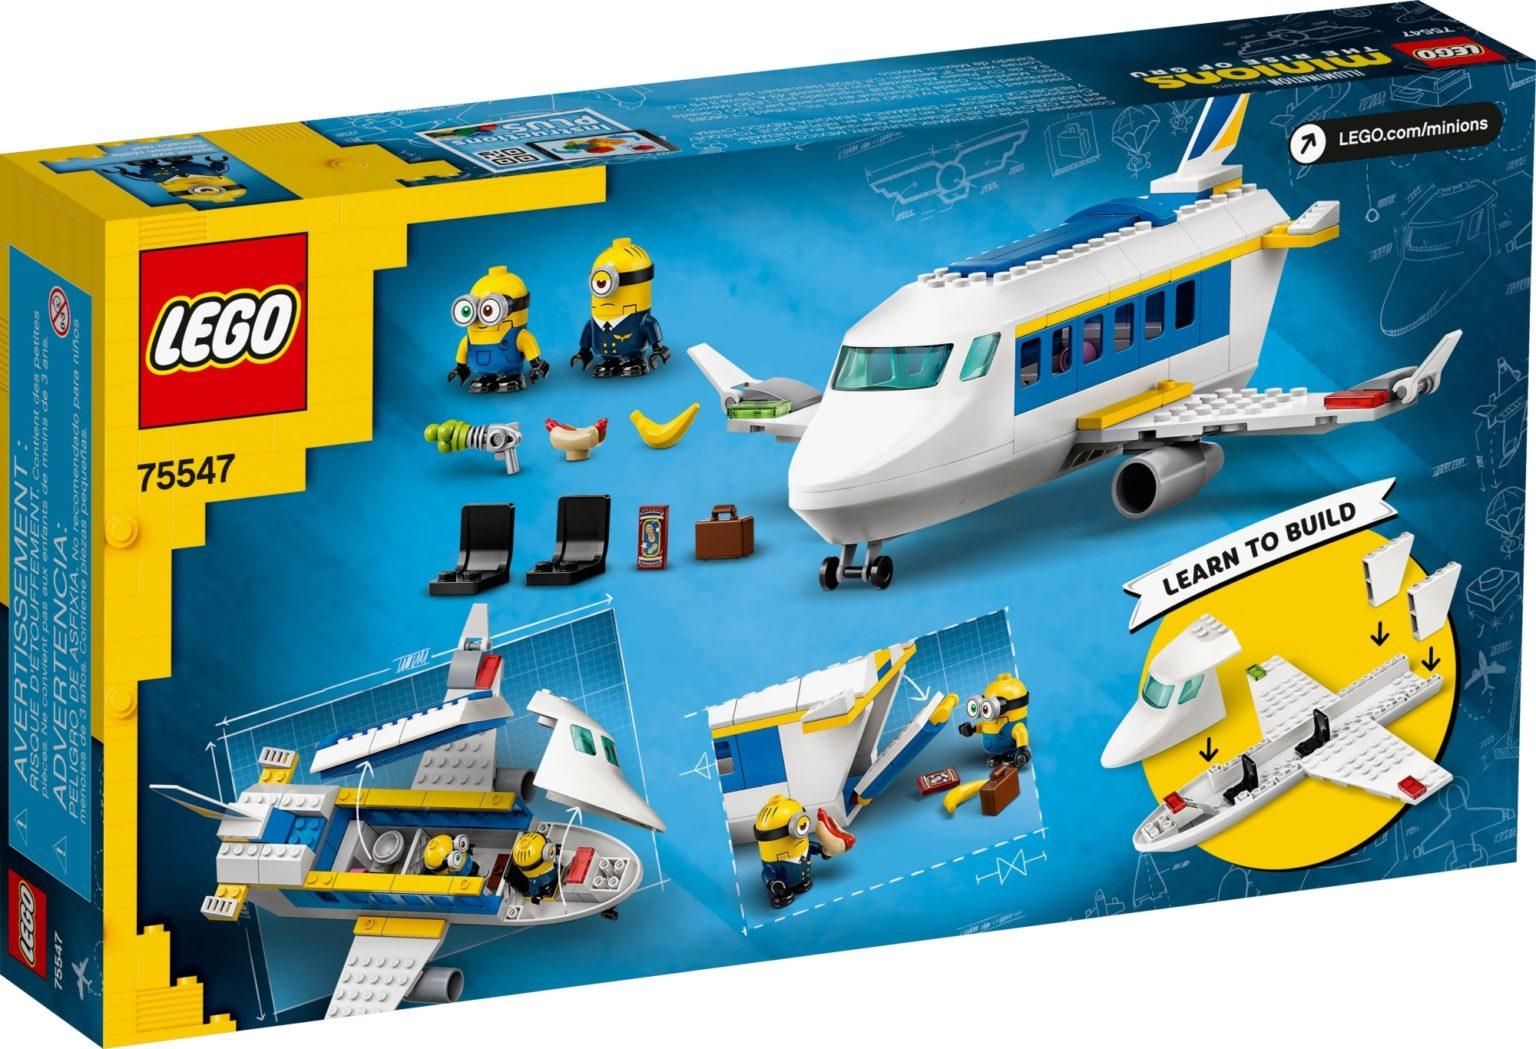 LEGO_75547_alt7